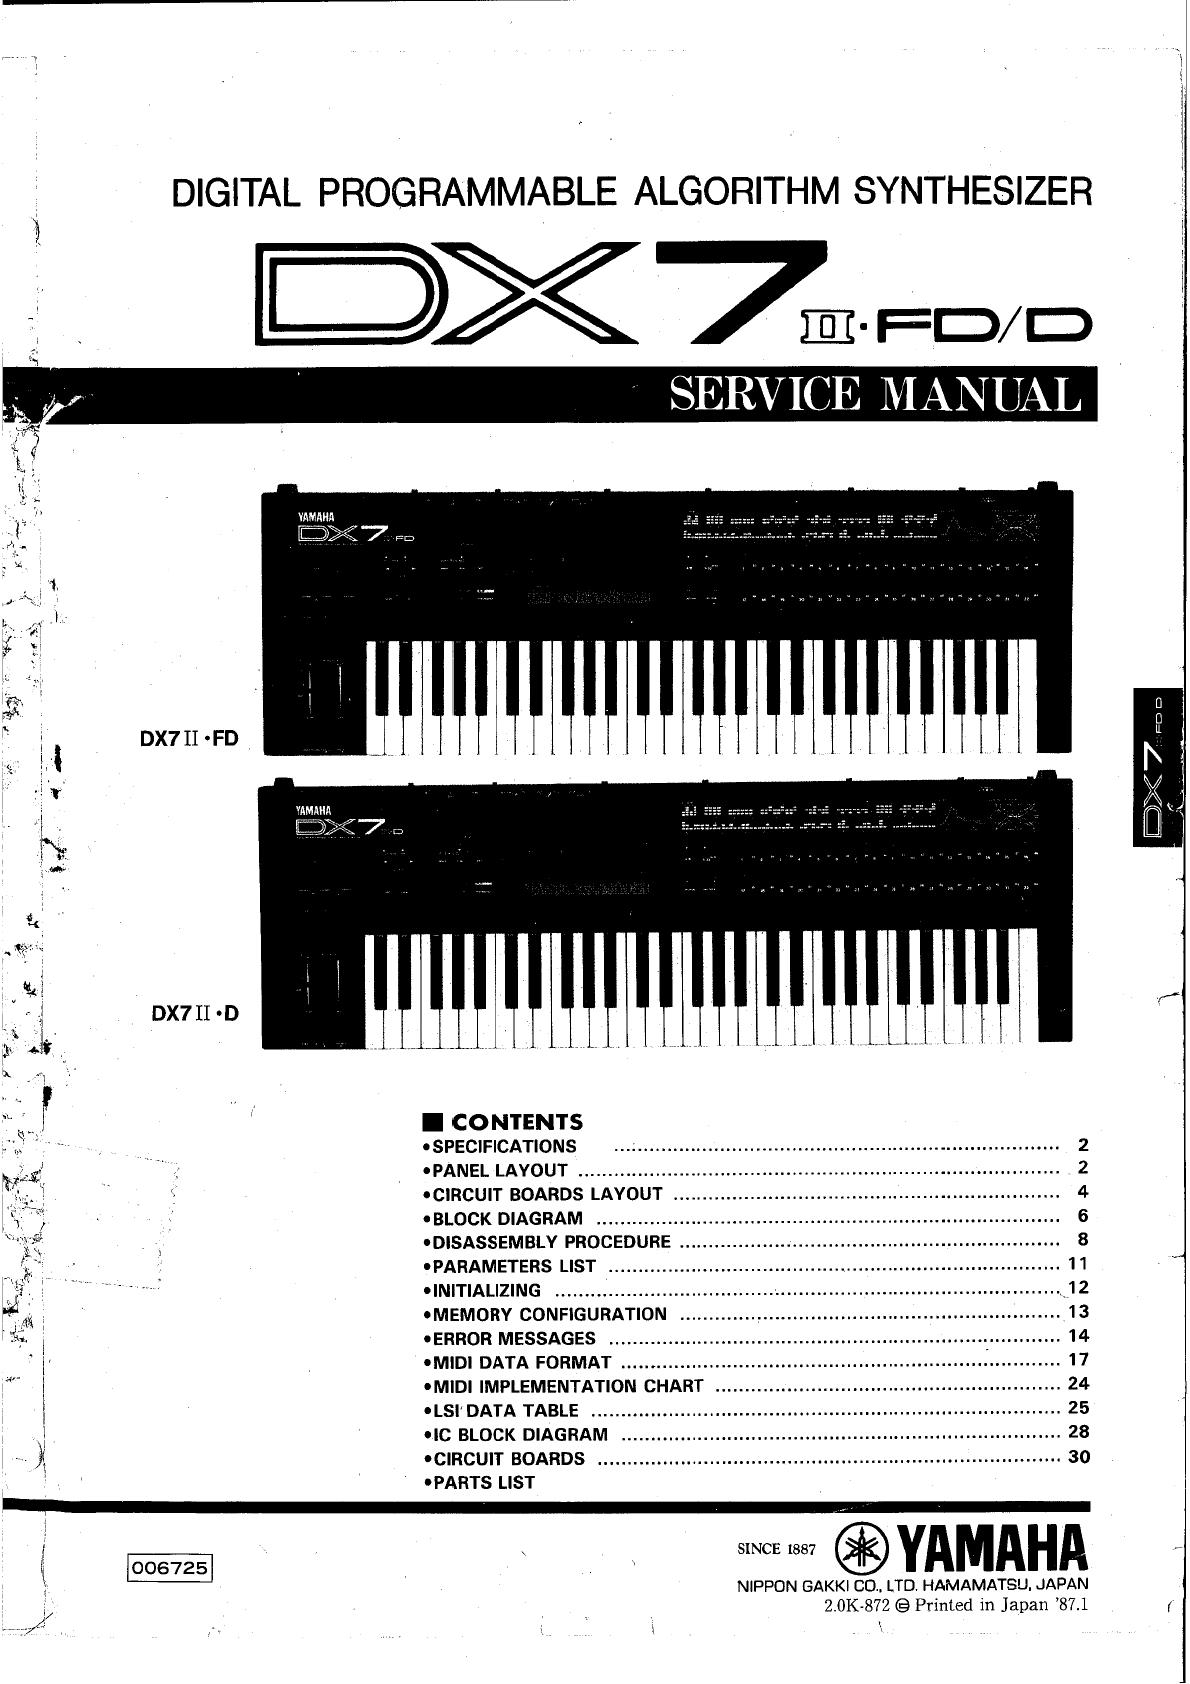 Yamaha Electronic Keyboard D Users Manual on